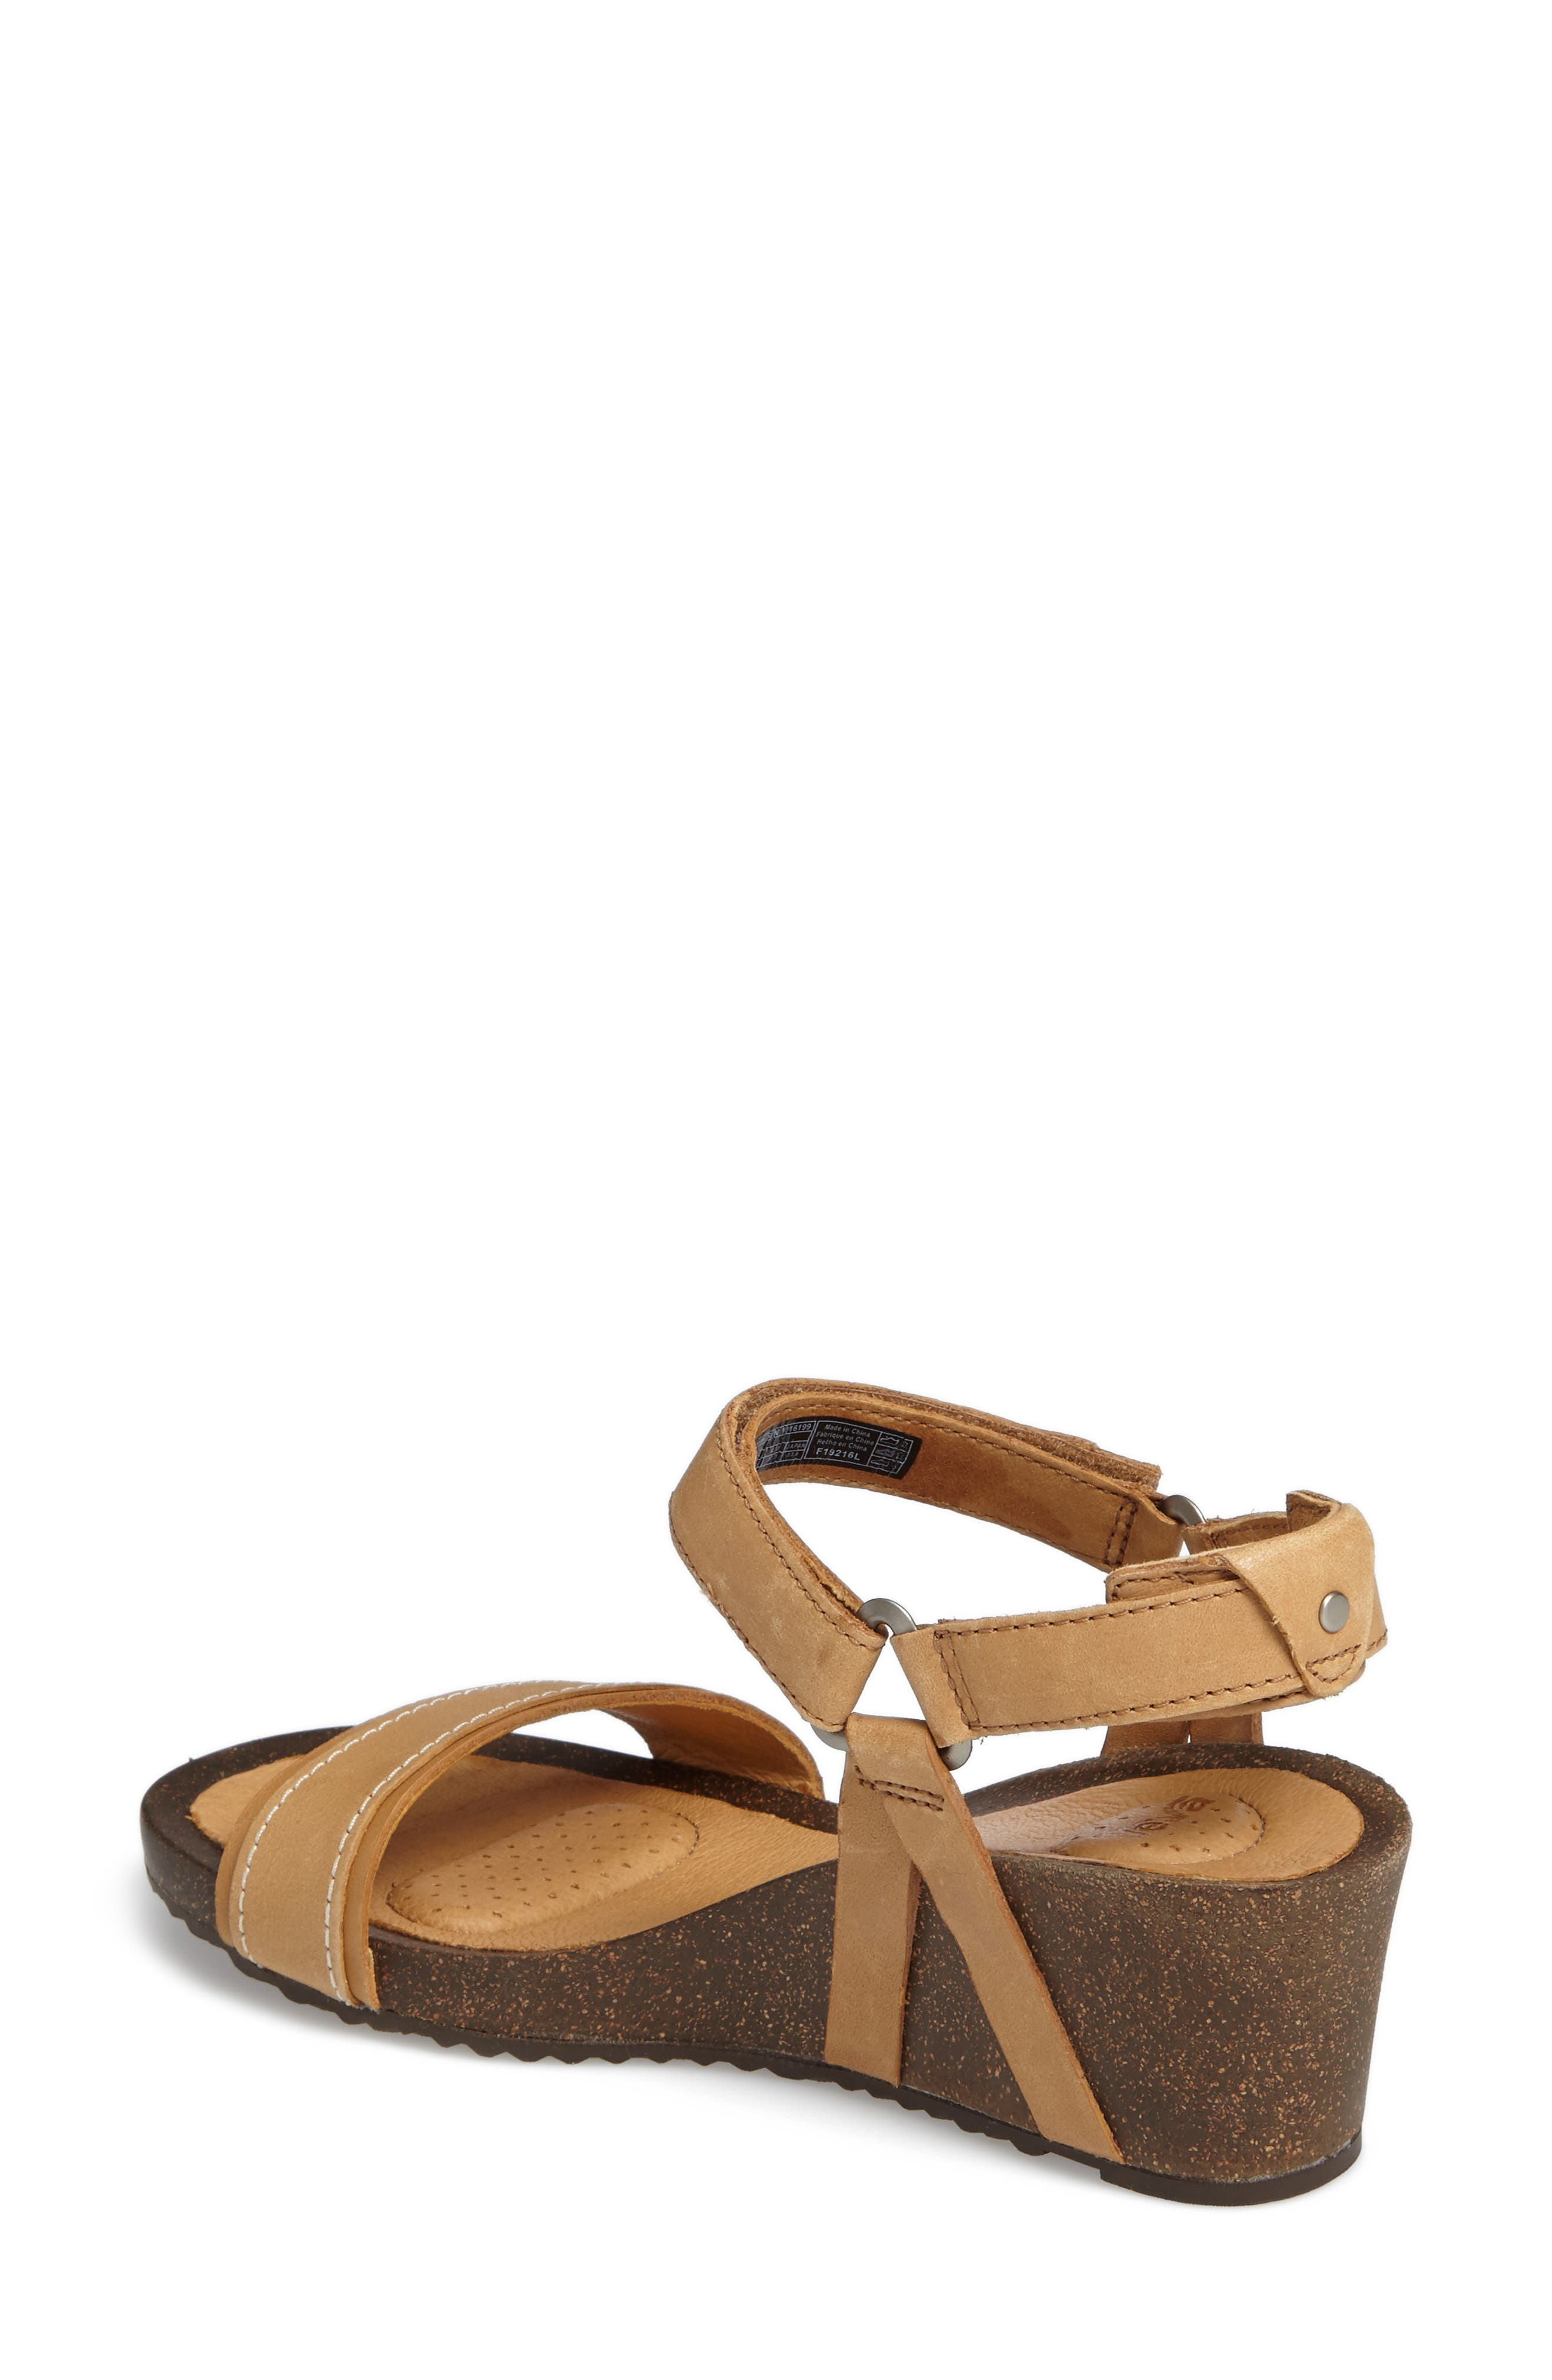 Alternate Image 2  - Teva Ysidro Stitch Wedge Sandal (Women)